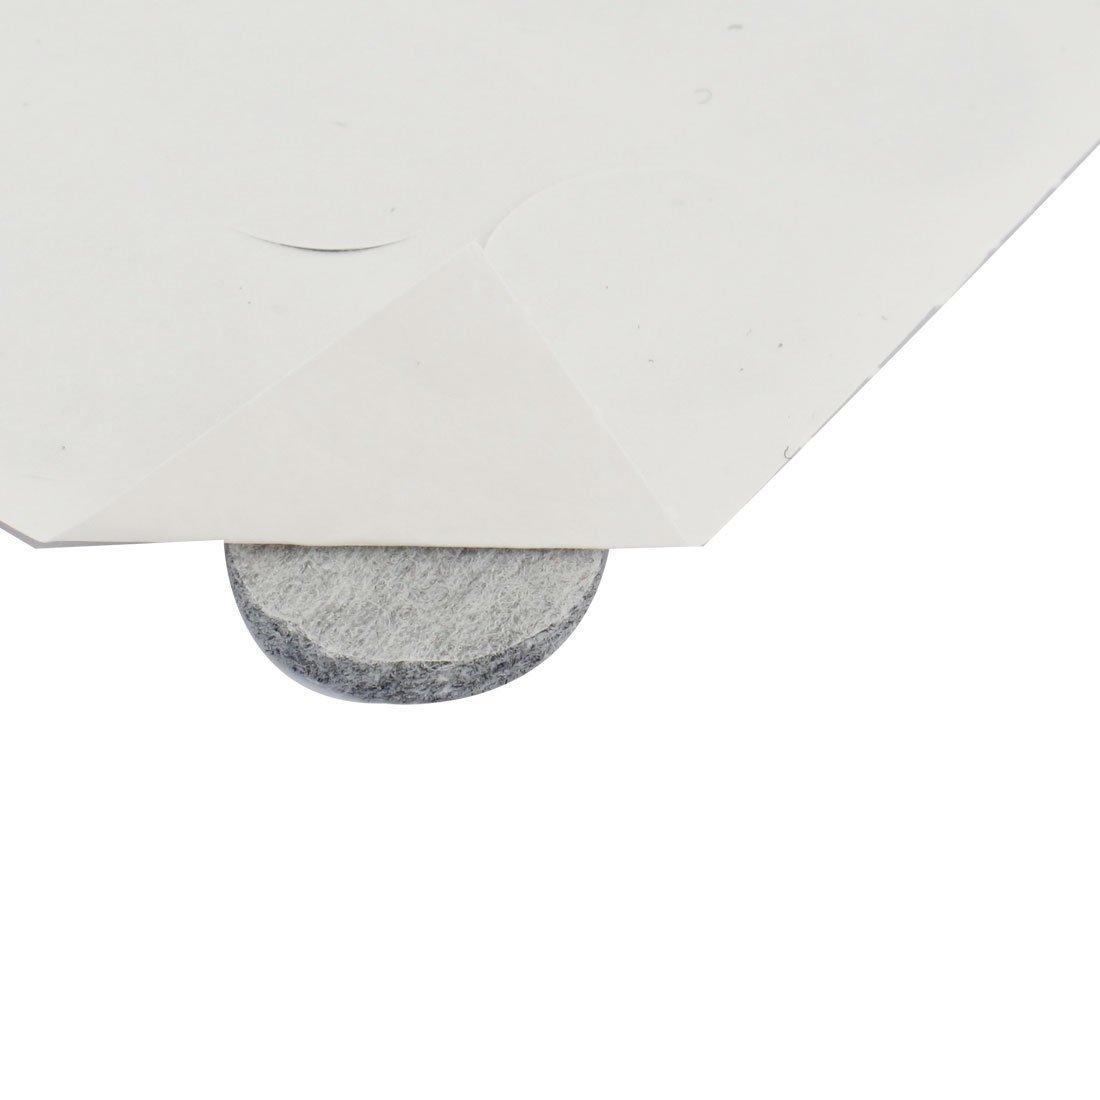 Amazon.com: Silla Mesa Redonda eDealMax Anti arañazos Muebles de fieltro de ratón fundas de cojines 18mm Dia 640pcs gris: Kitchen & Dining